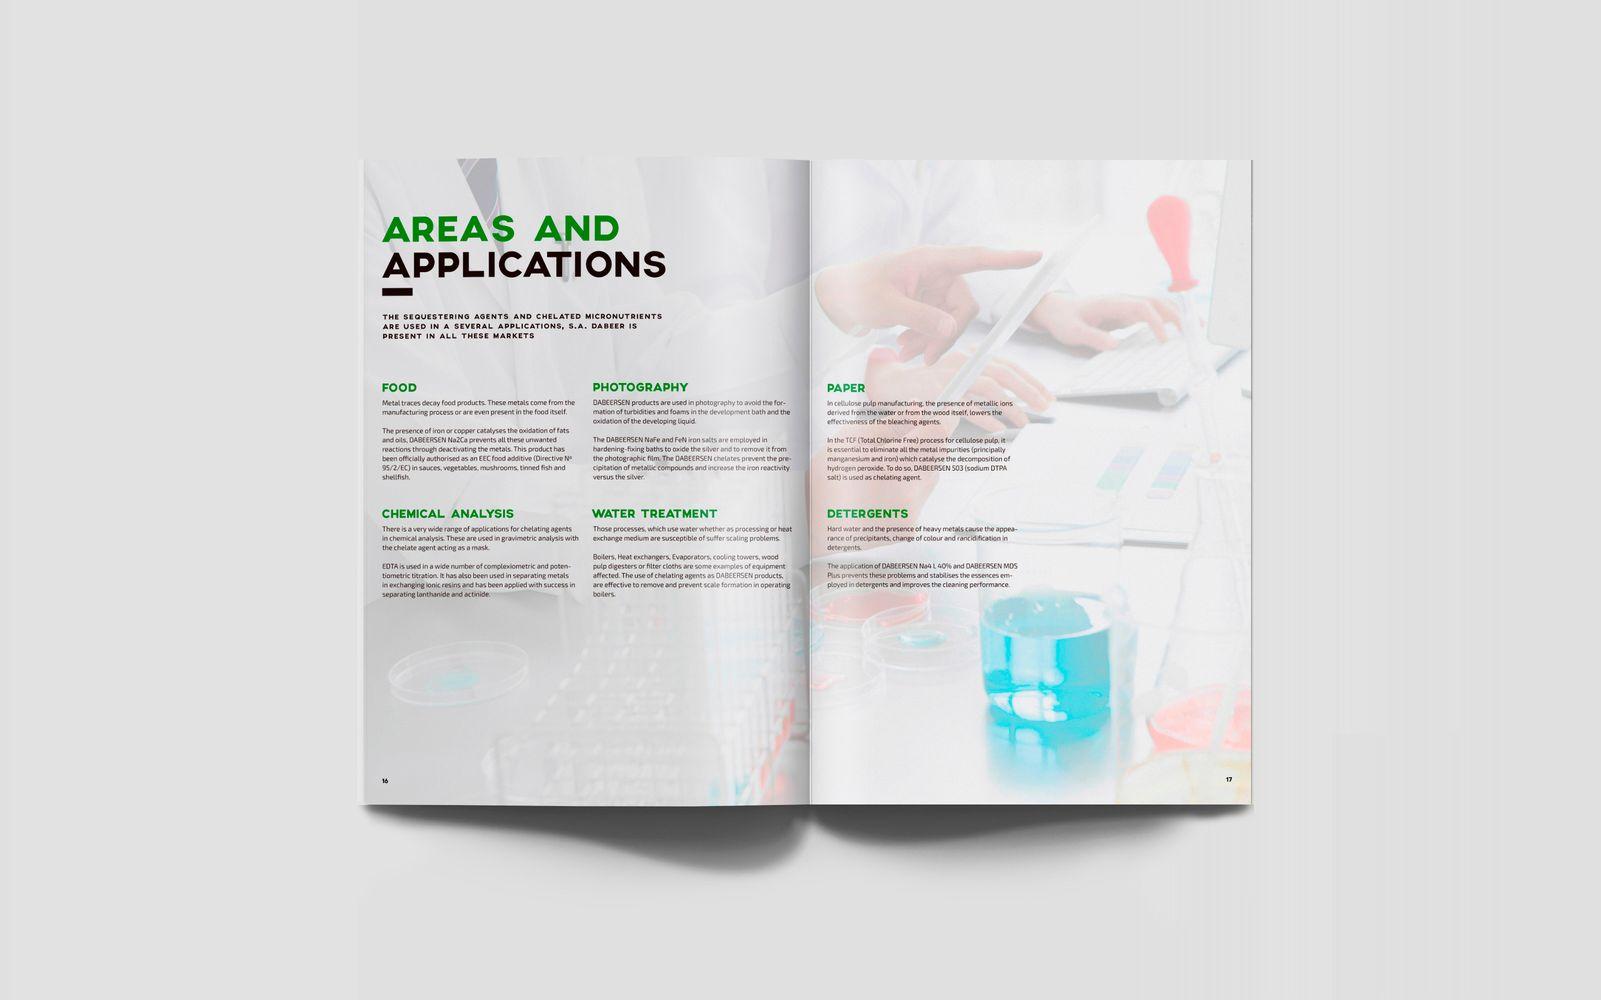 diseño grafico  Catálogo corporativo     9